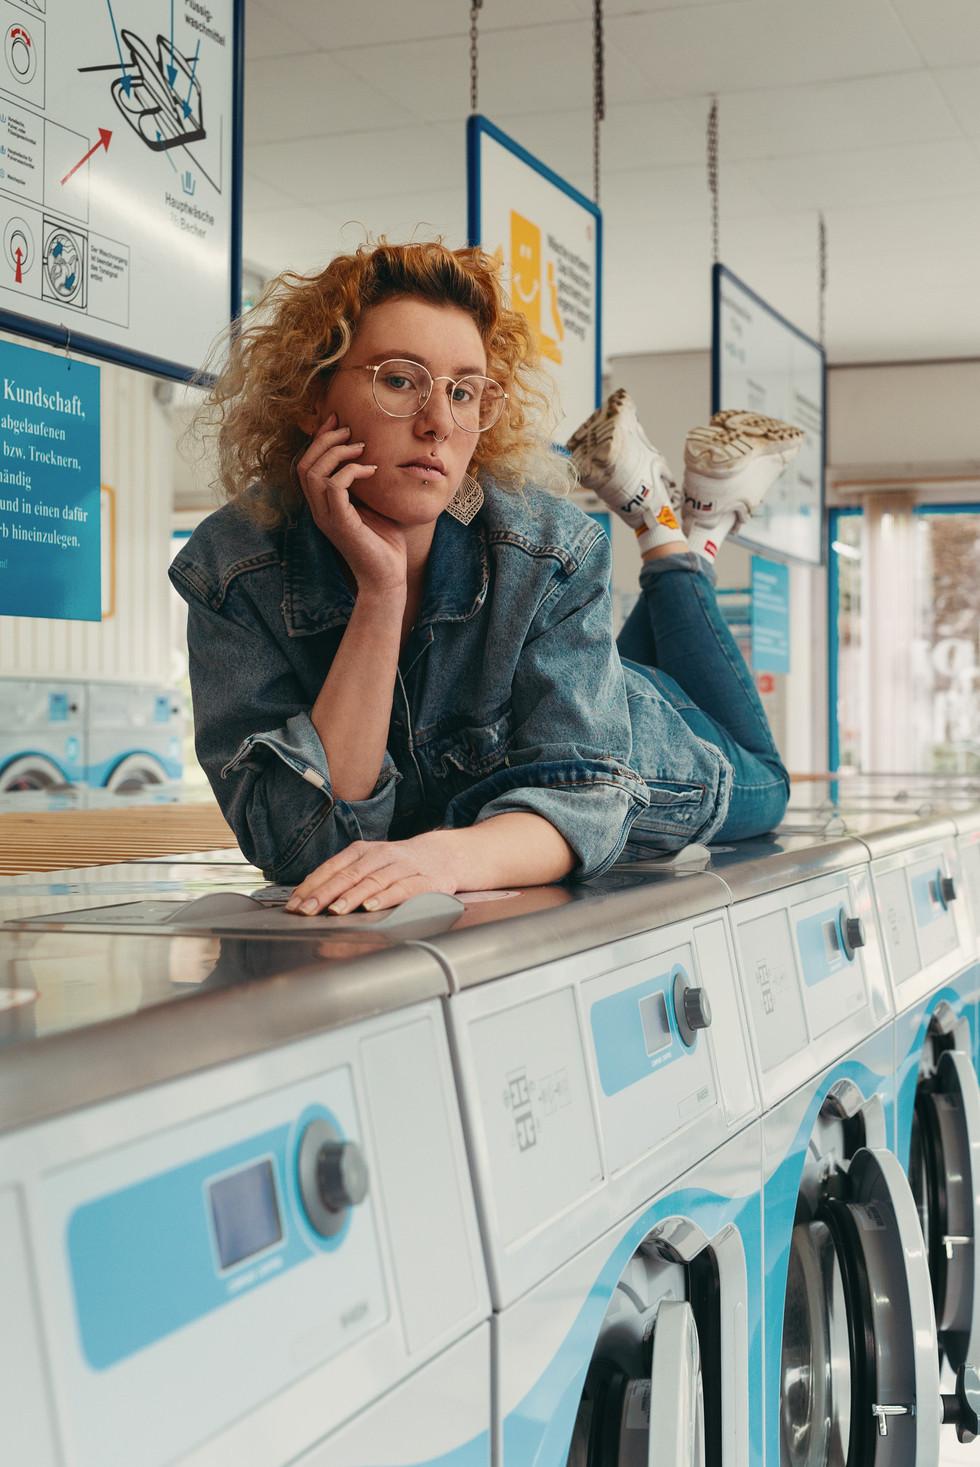 Fashion Photography by Jill Abanico, Ruhrgebiet, Deutschland